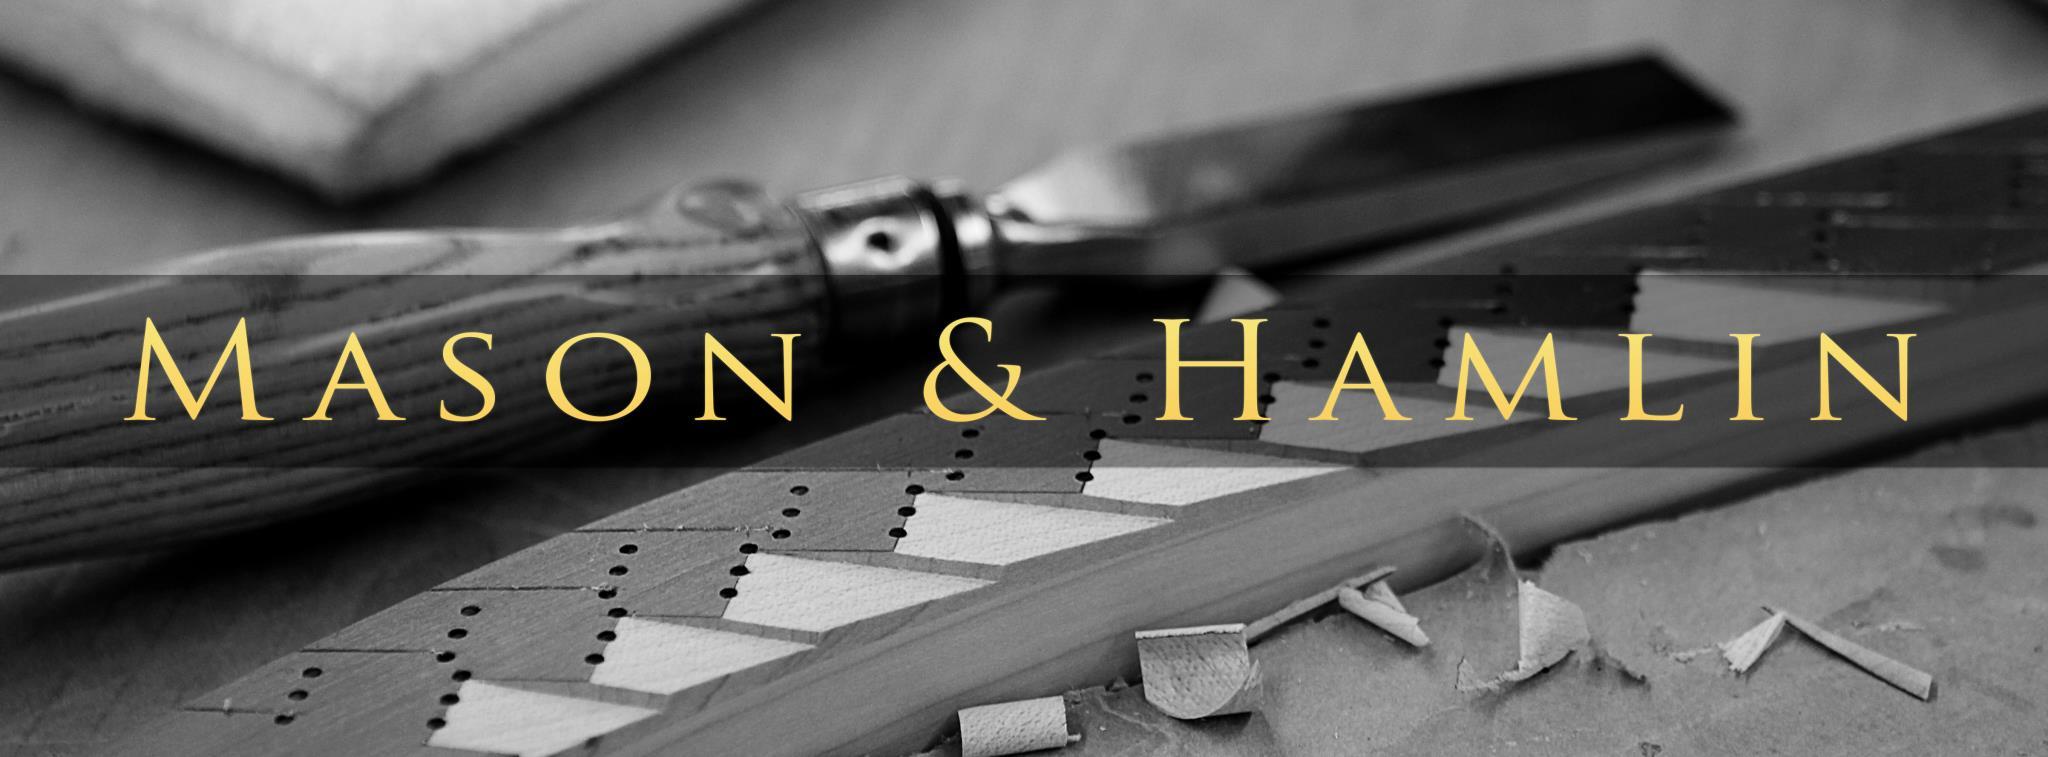 mason and hamlin 3.jpg